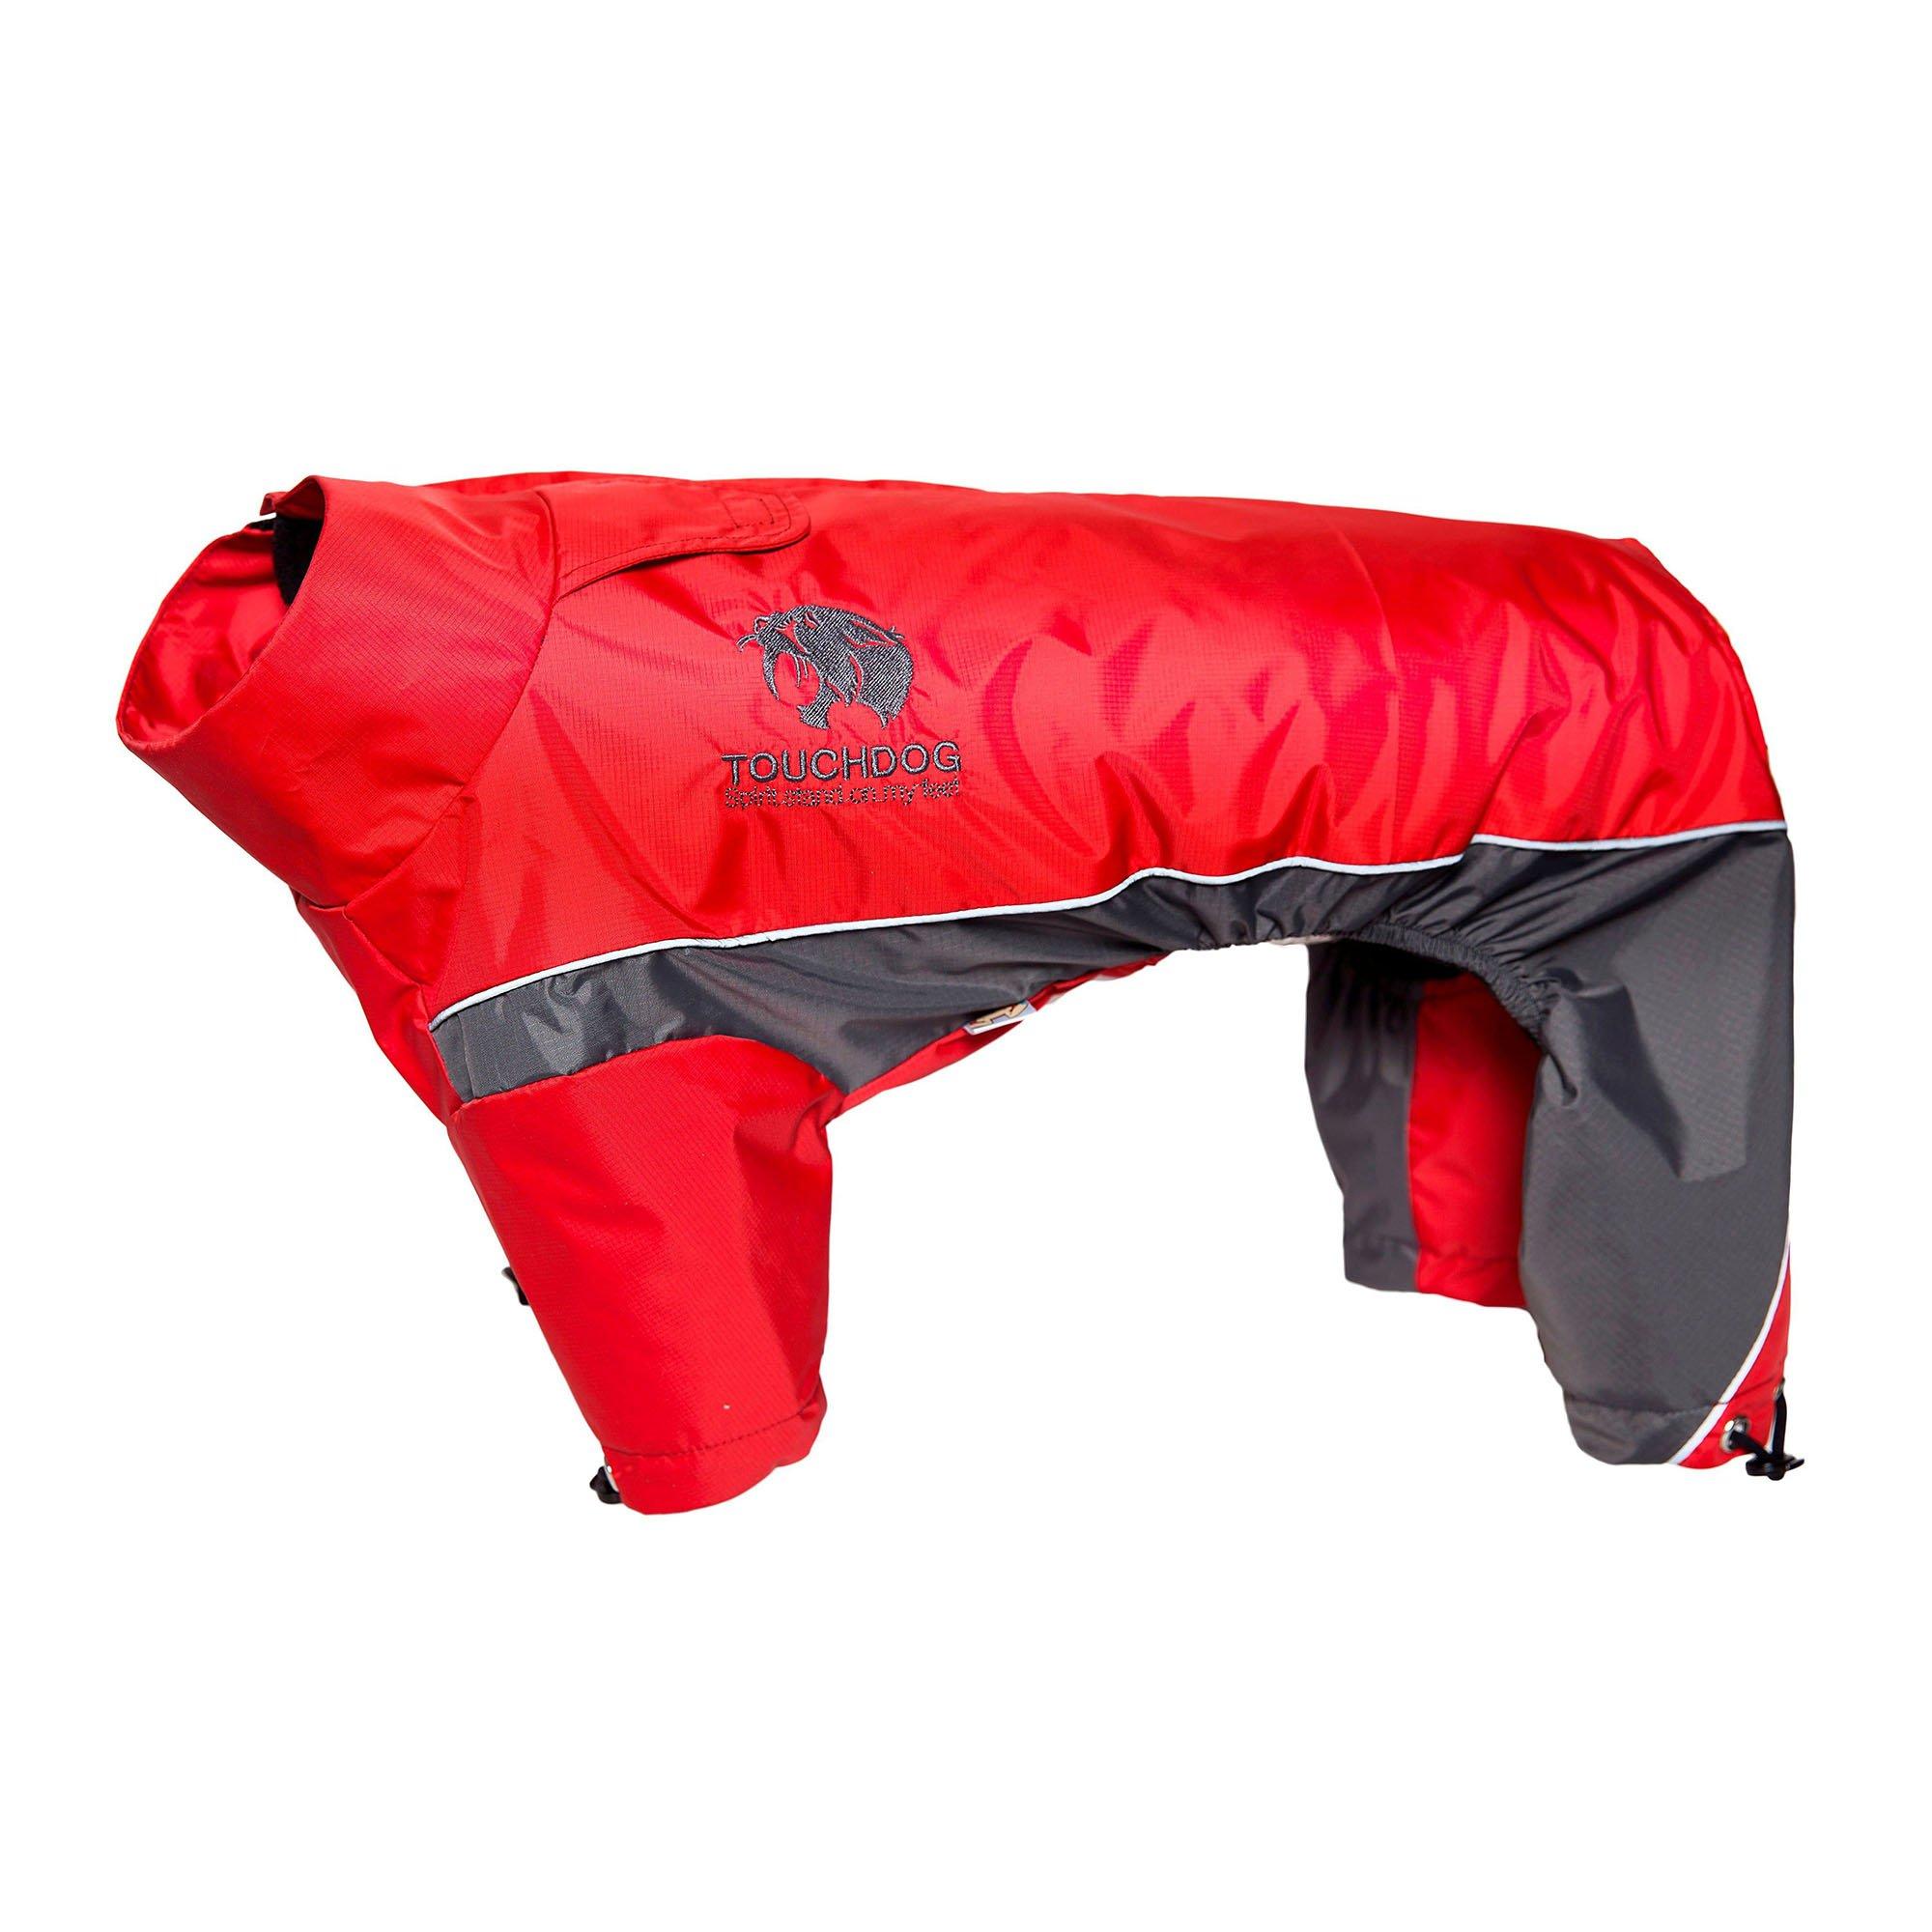 Touchdog Quantum-Ice Full-Bodied Adjustable and 3M Reflective Dog Jacket w/ Blackshark Technology, Red-Charcoal Grey X-Large (812131035215 Lifestyle Pet Pet Apparel T-Shirts & Jackets) photo